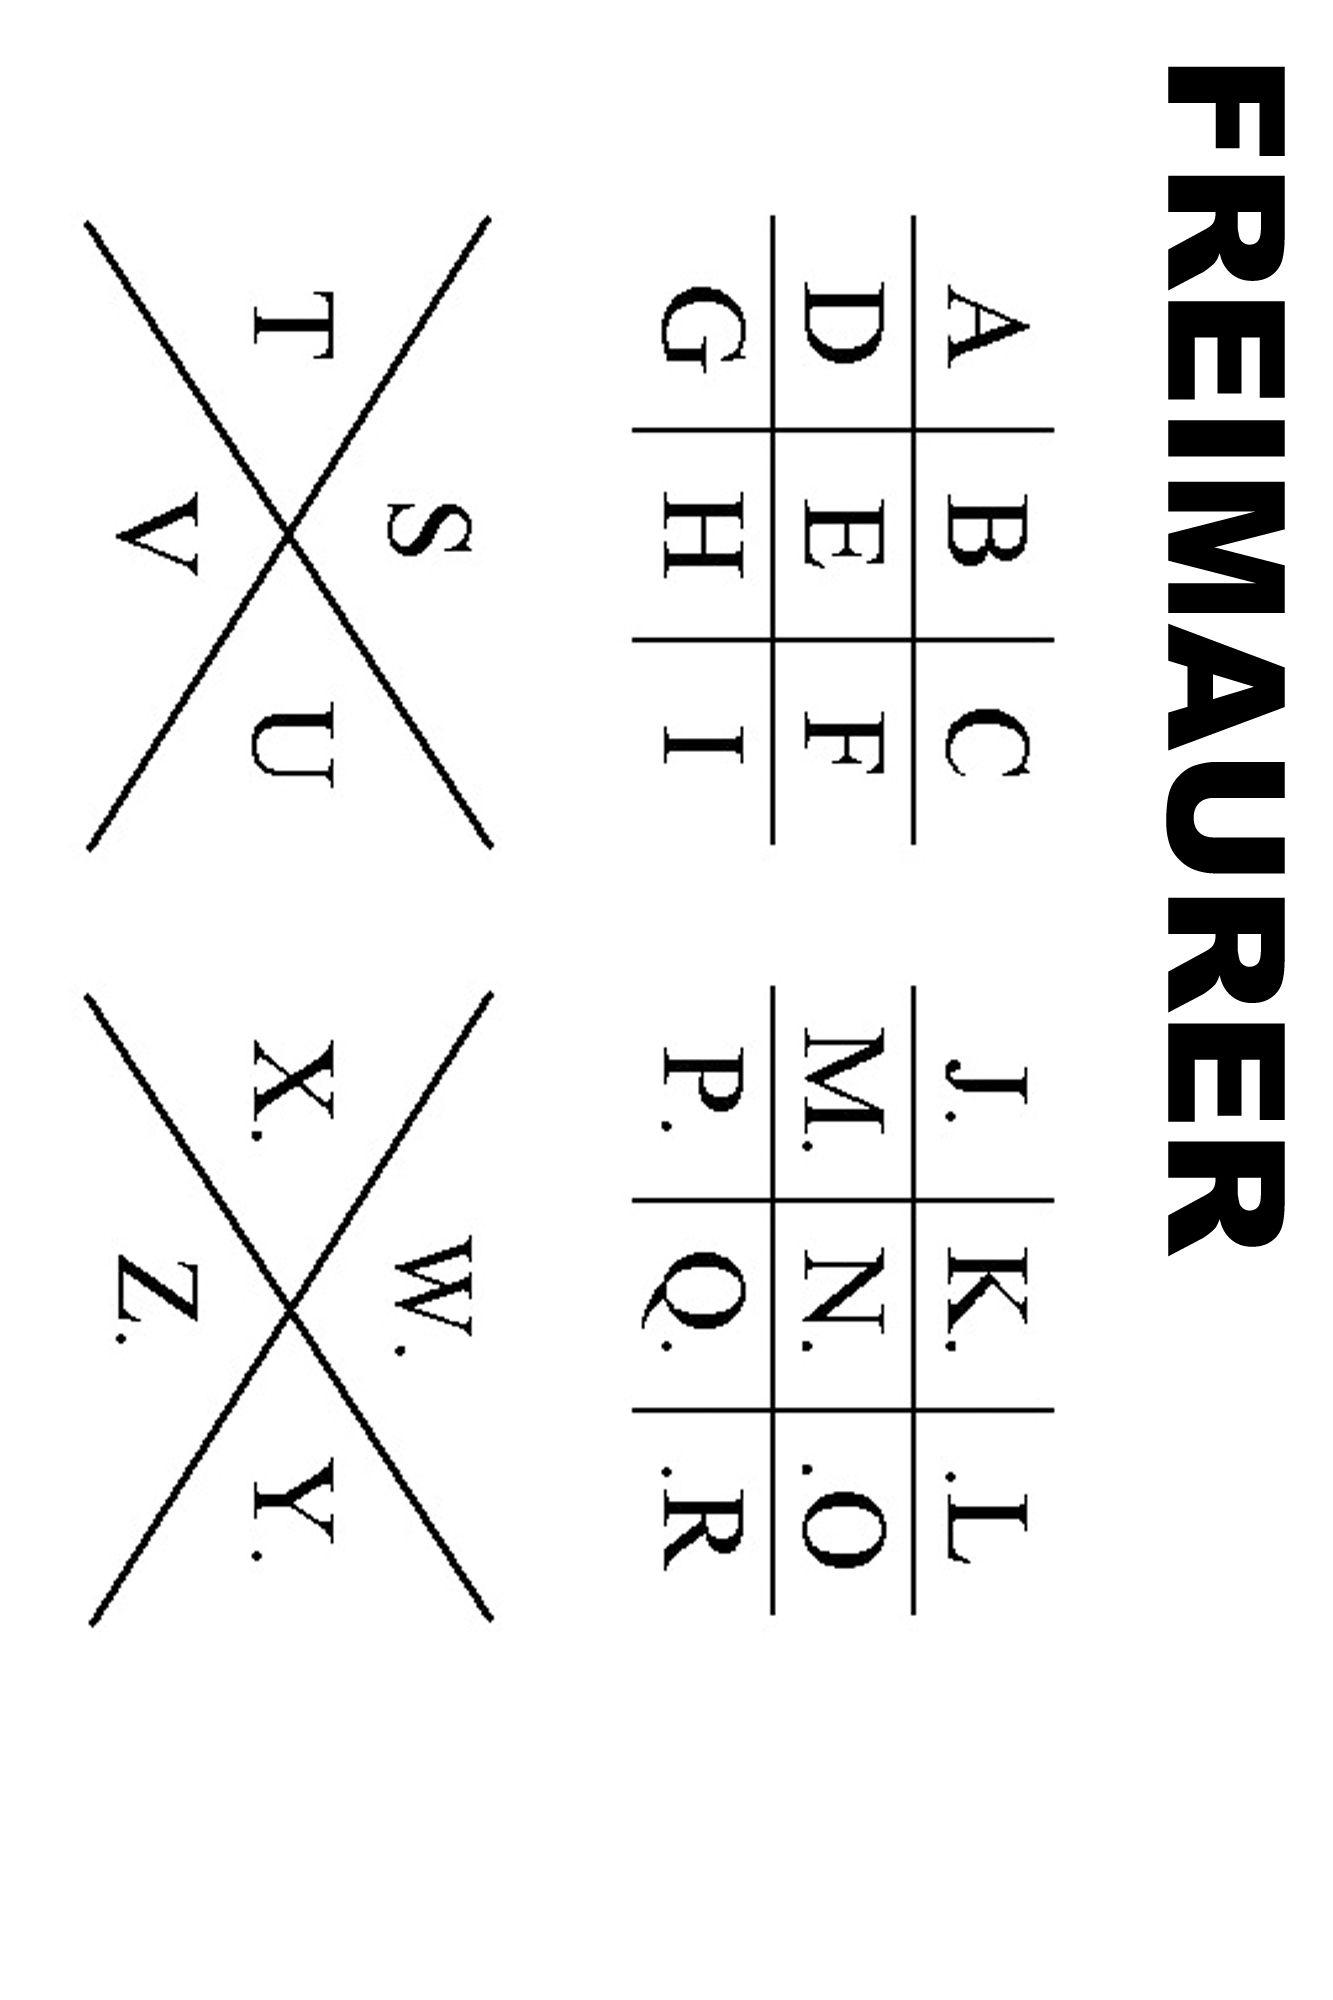 Ogham Alphabet Celtic tree alphabet Possible geocache puzzle